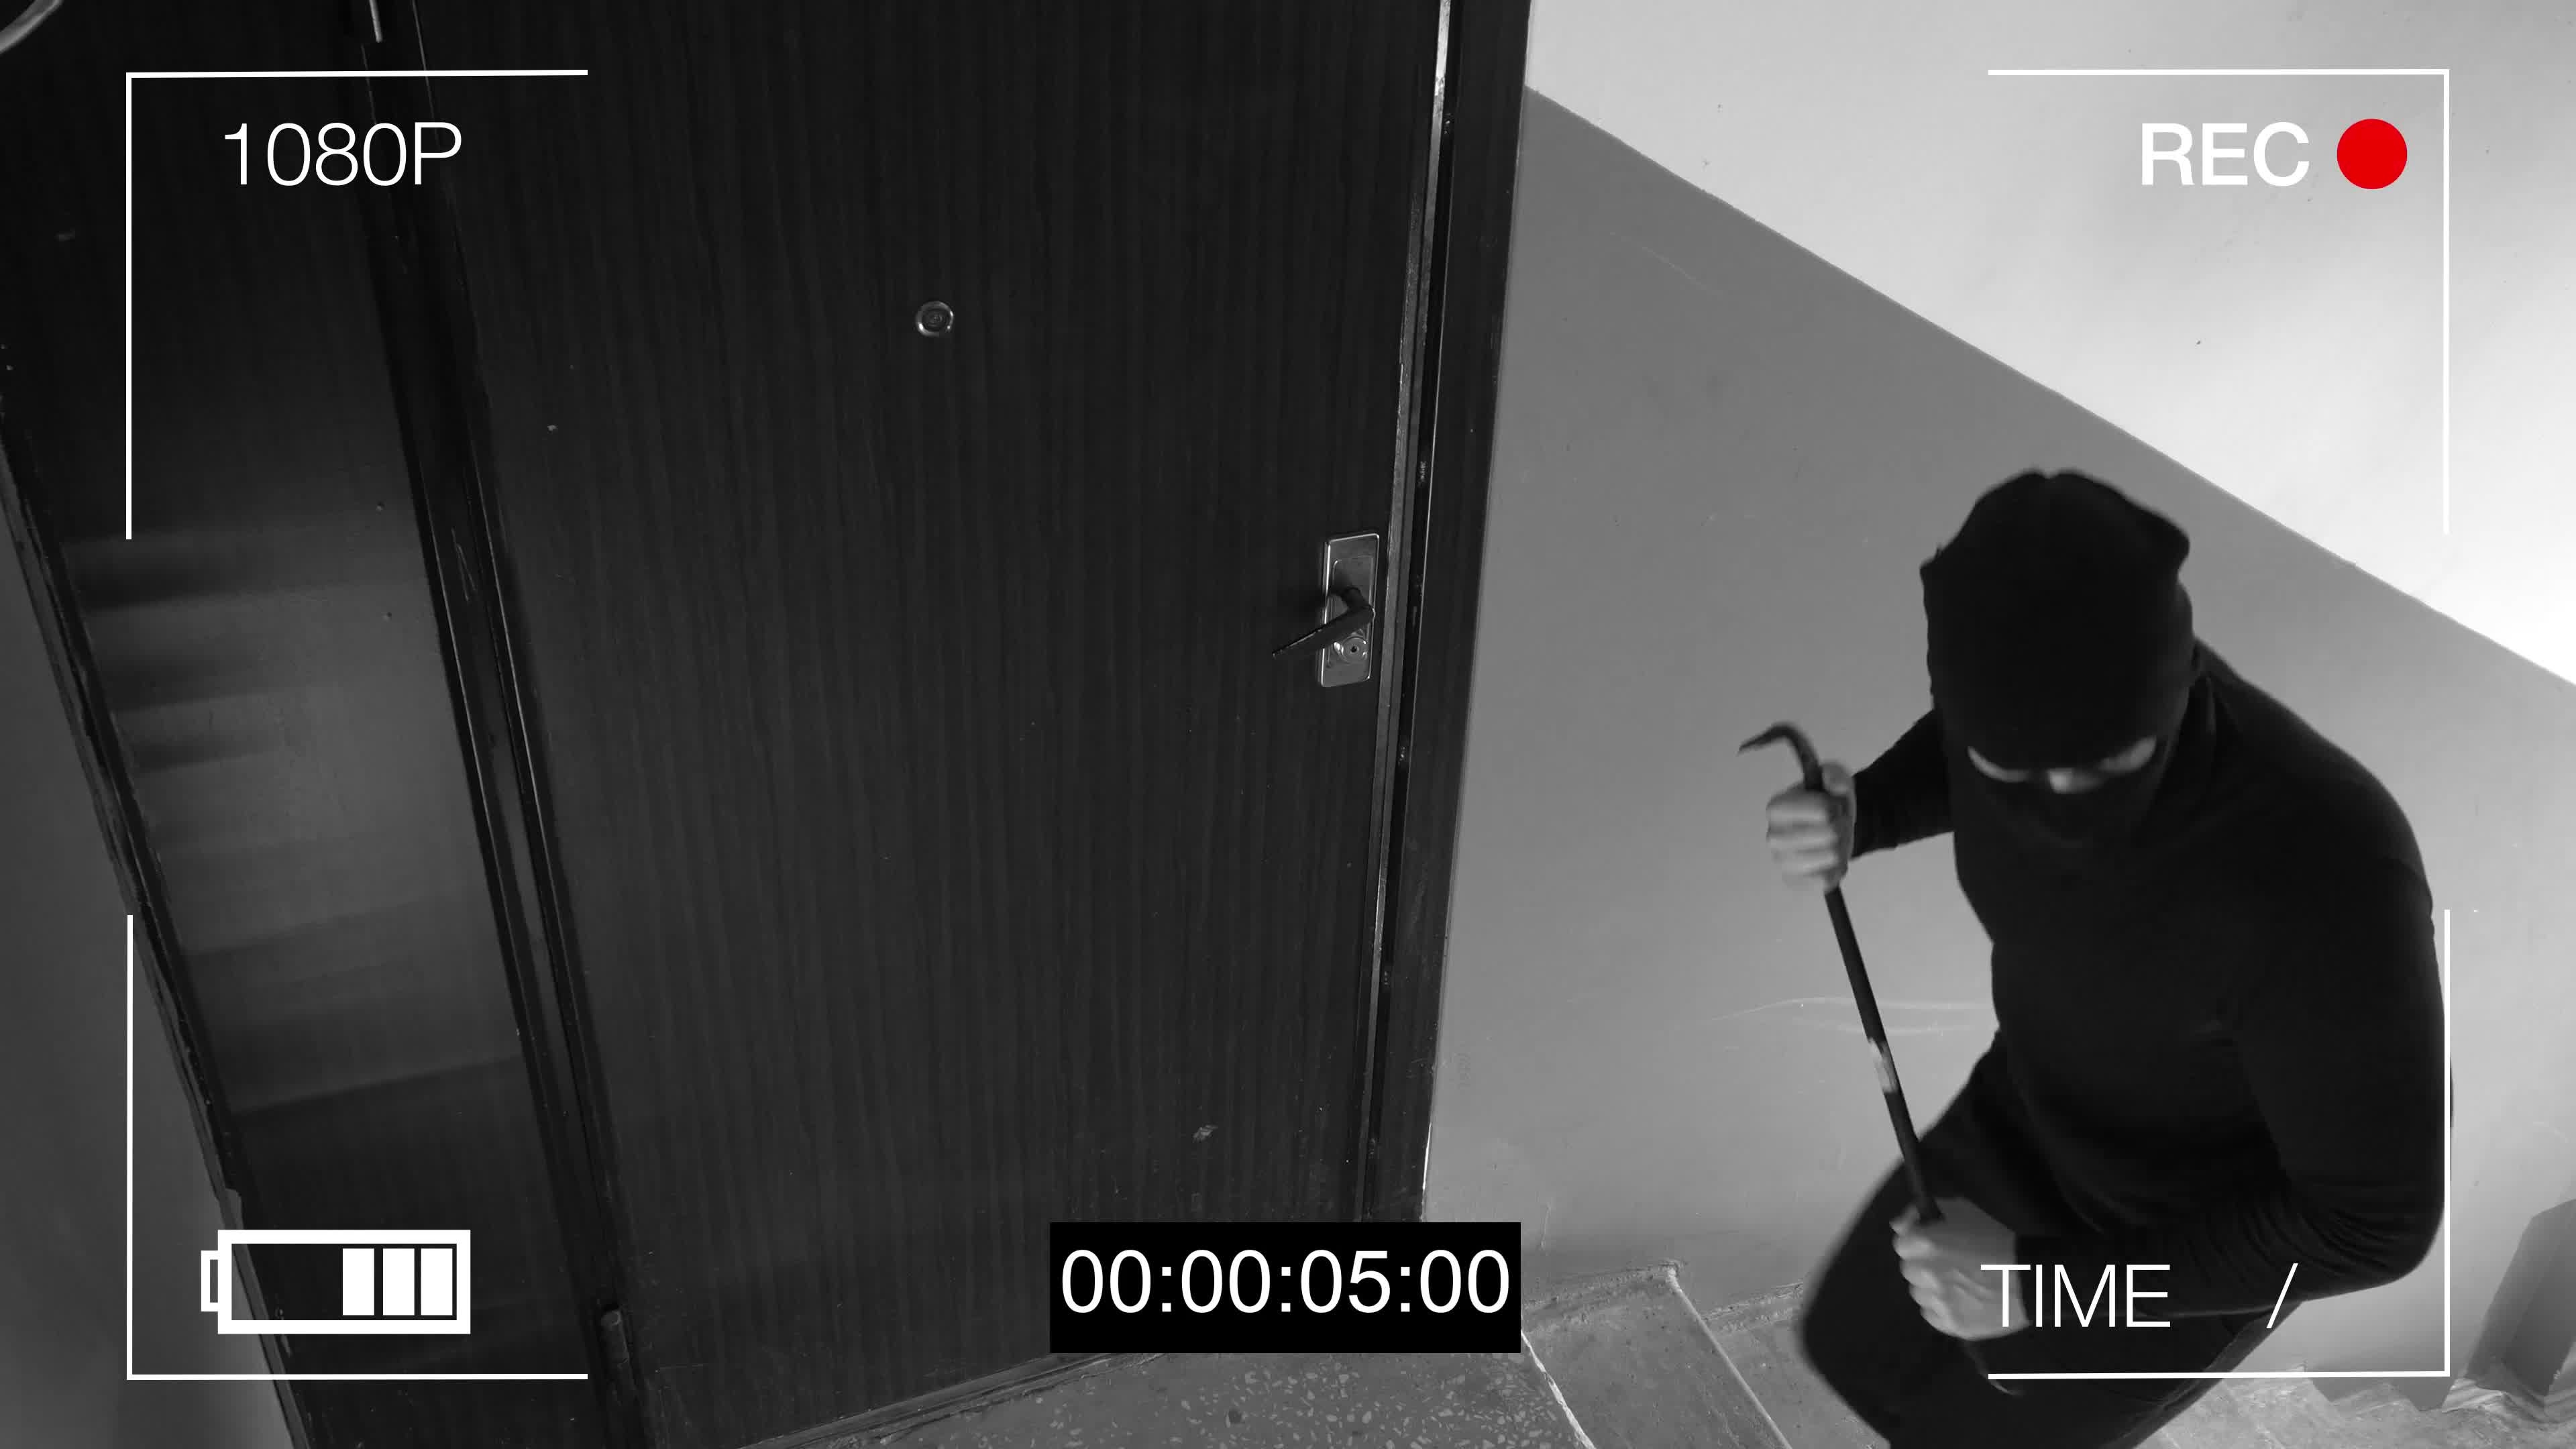 voleur caméra sécurité intrusion